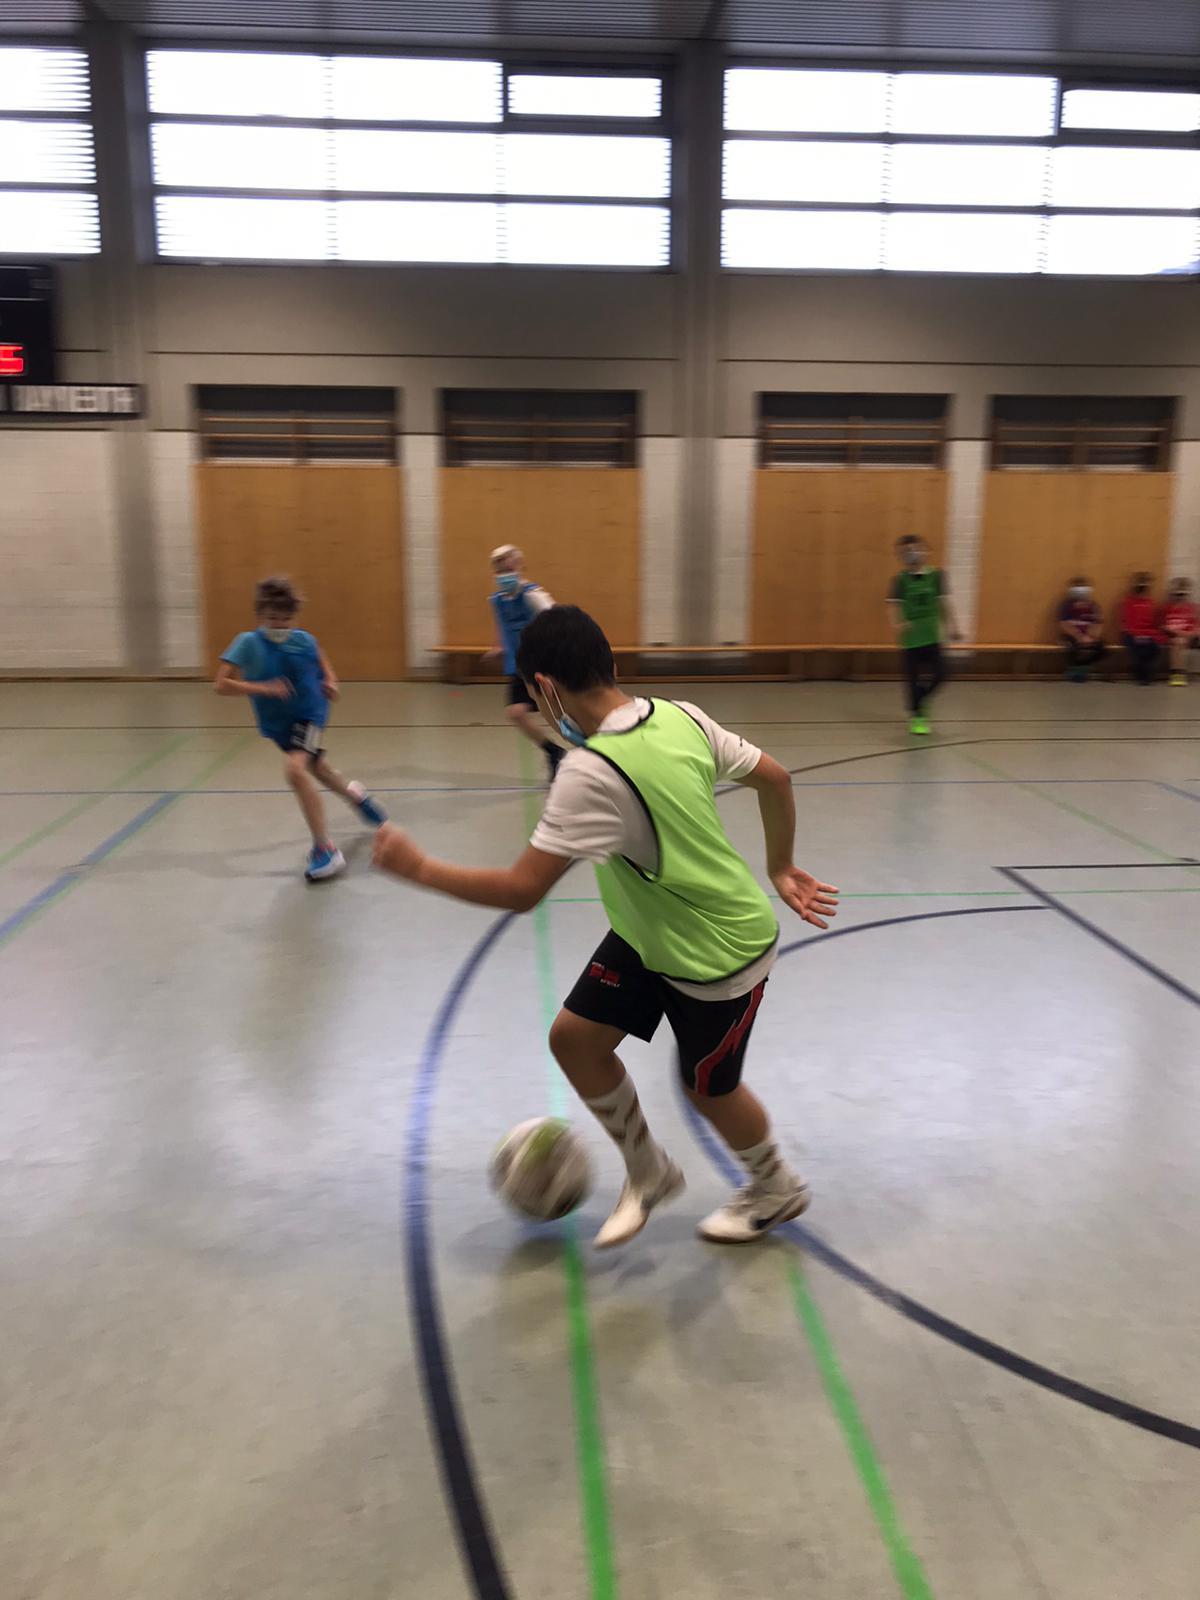 Blog - 2021 Fußballklasse Bild 1